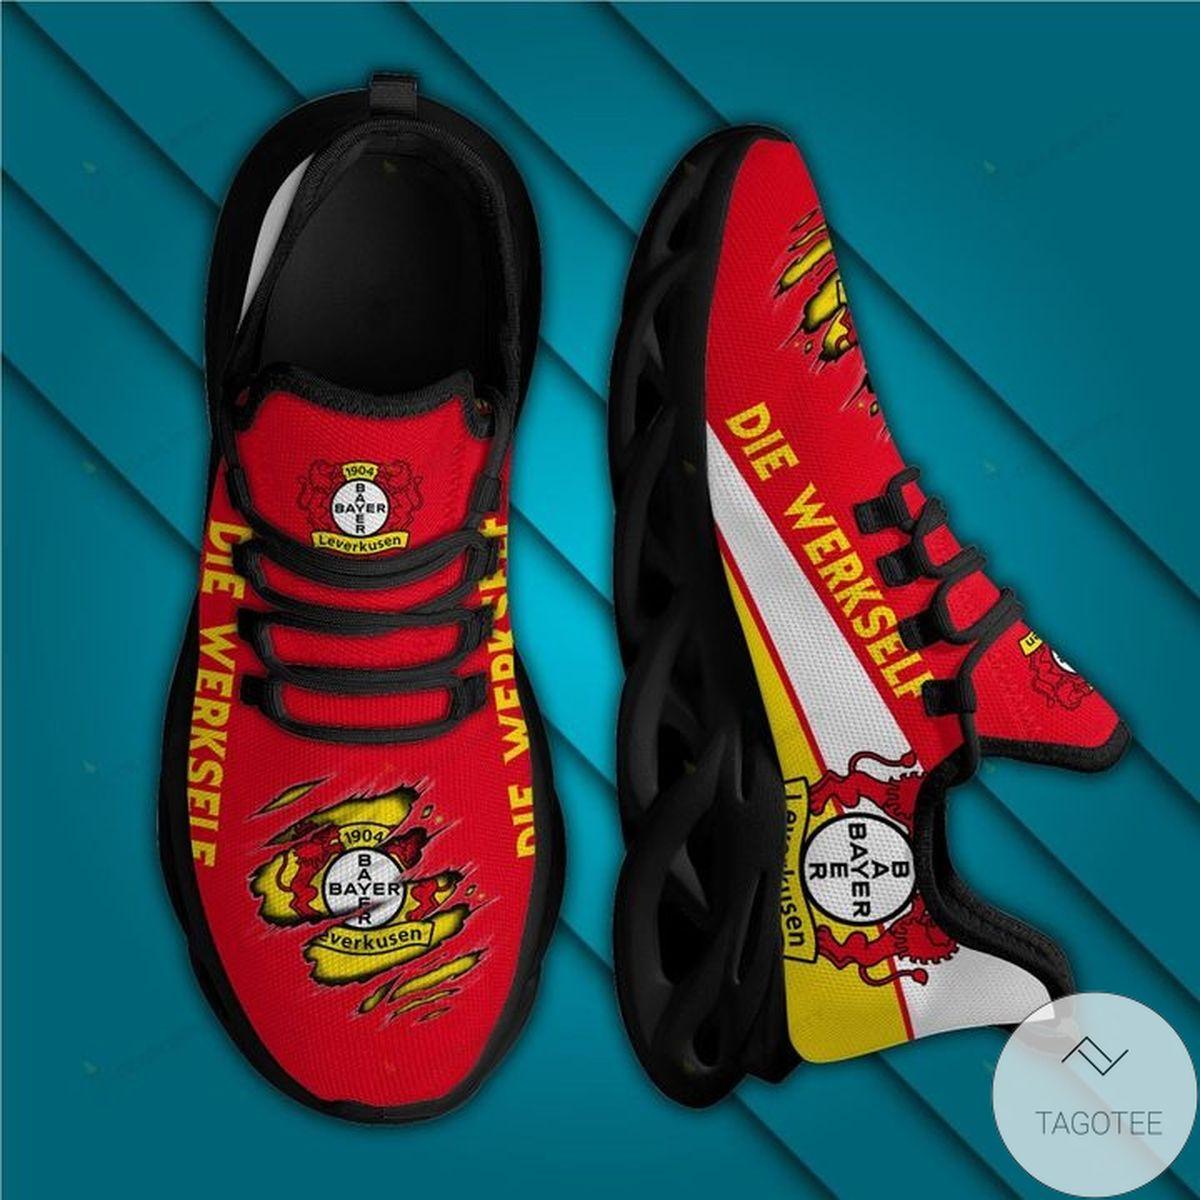 Bundesliga Bayer 04 Leverkusen Max Soul Shoes z